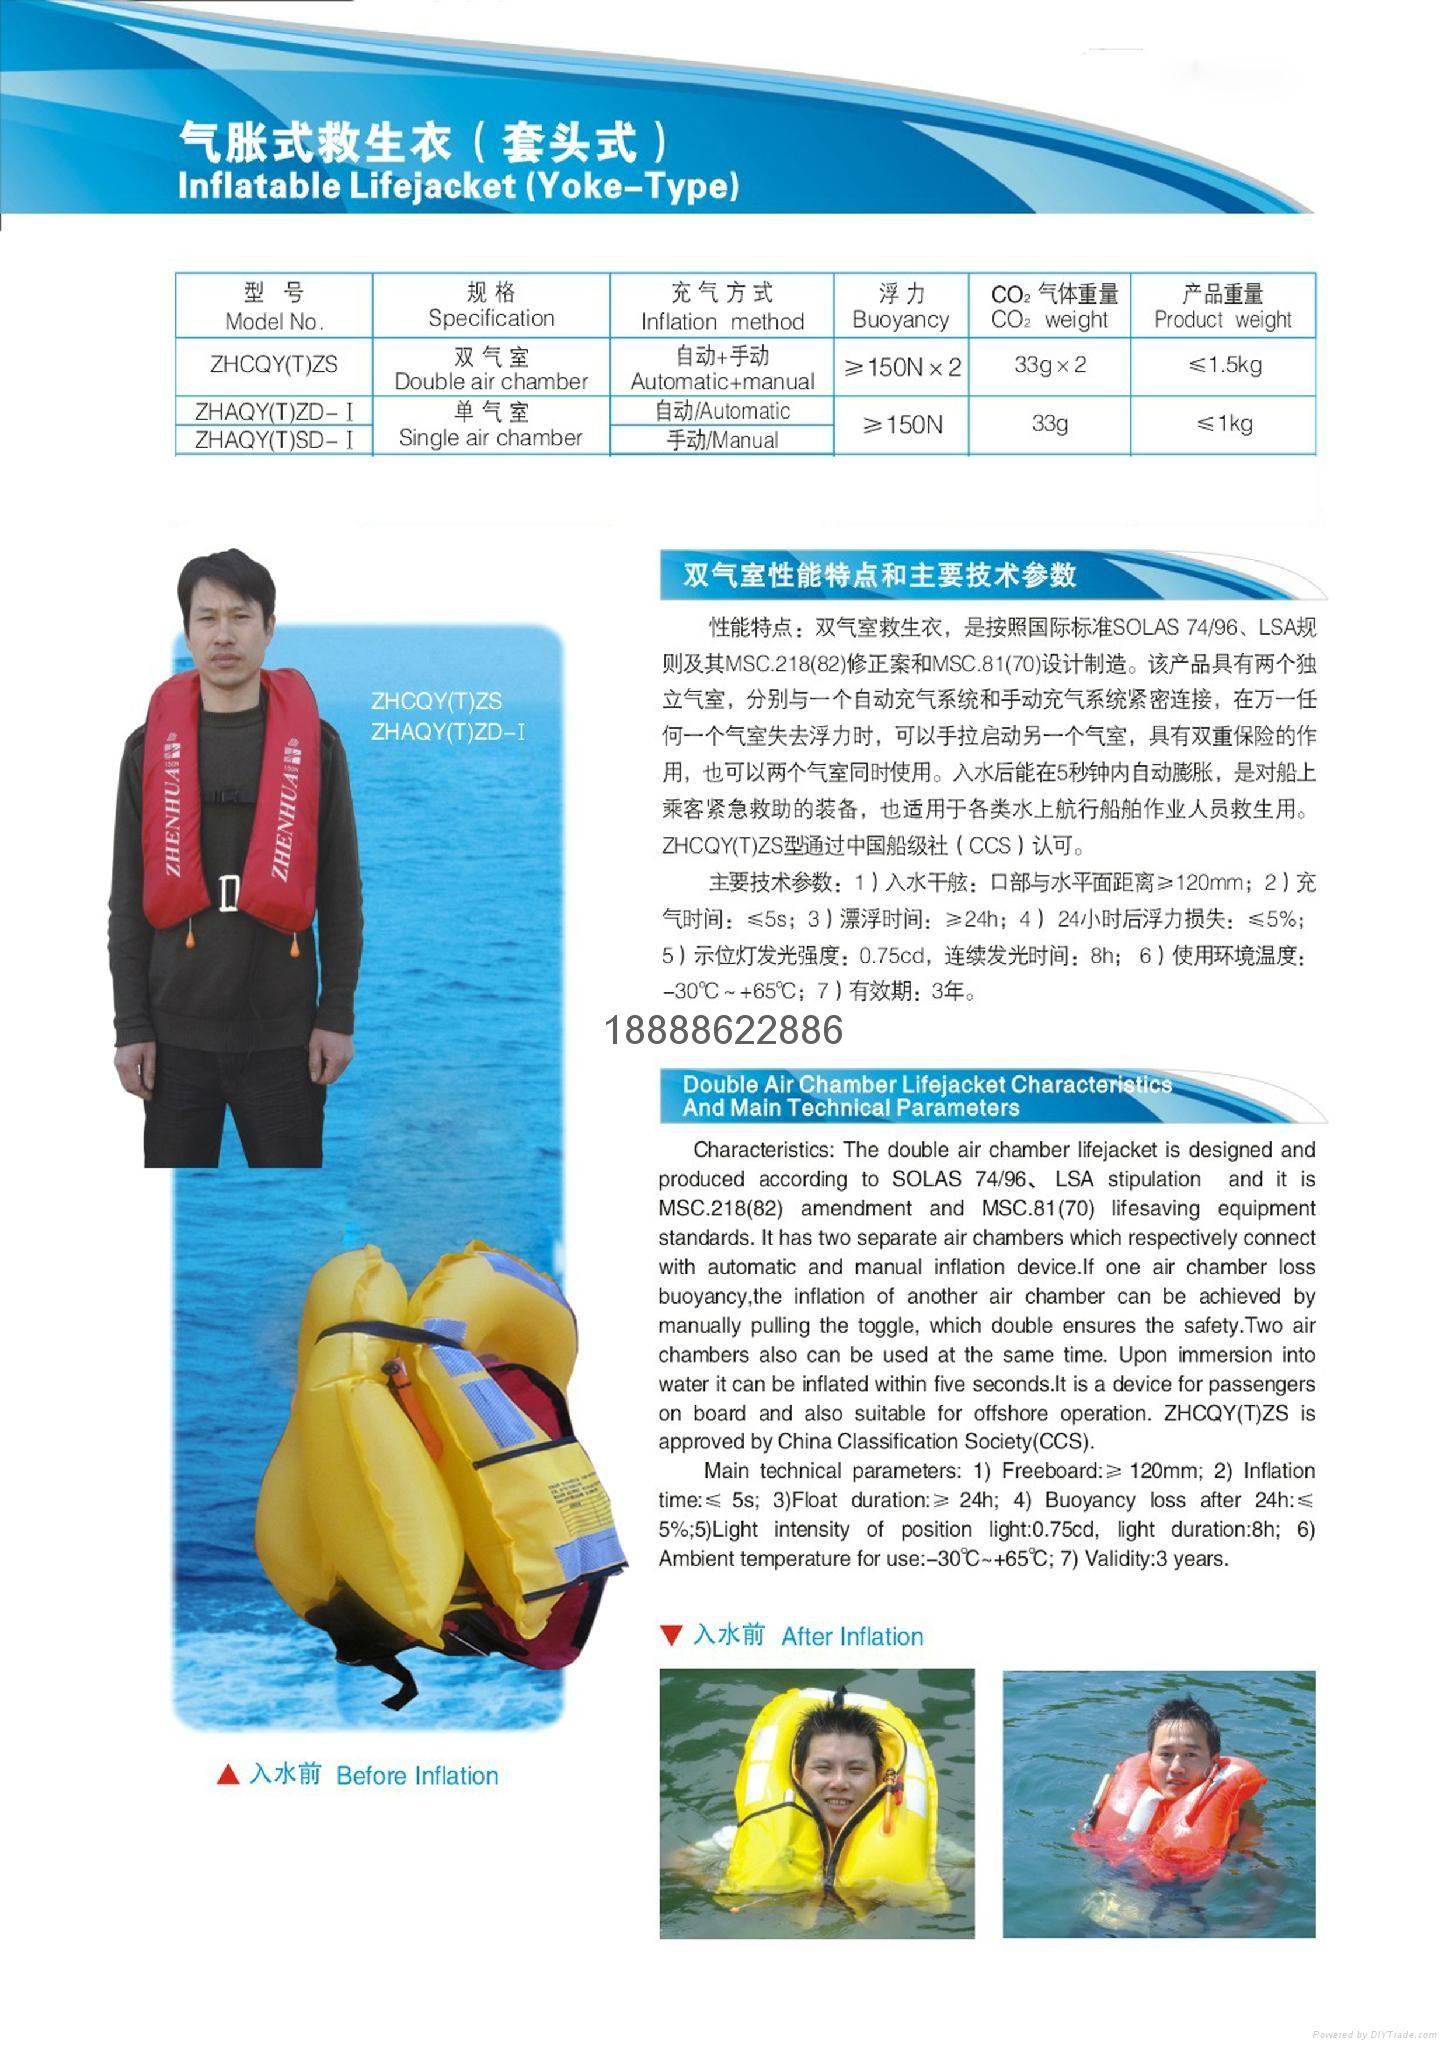 SOLAS圍巾式雙氣室氣脹救生衣ZHCQY(T)ZS型 5